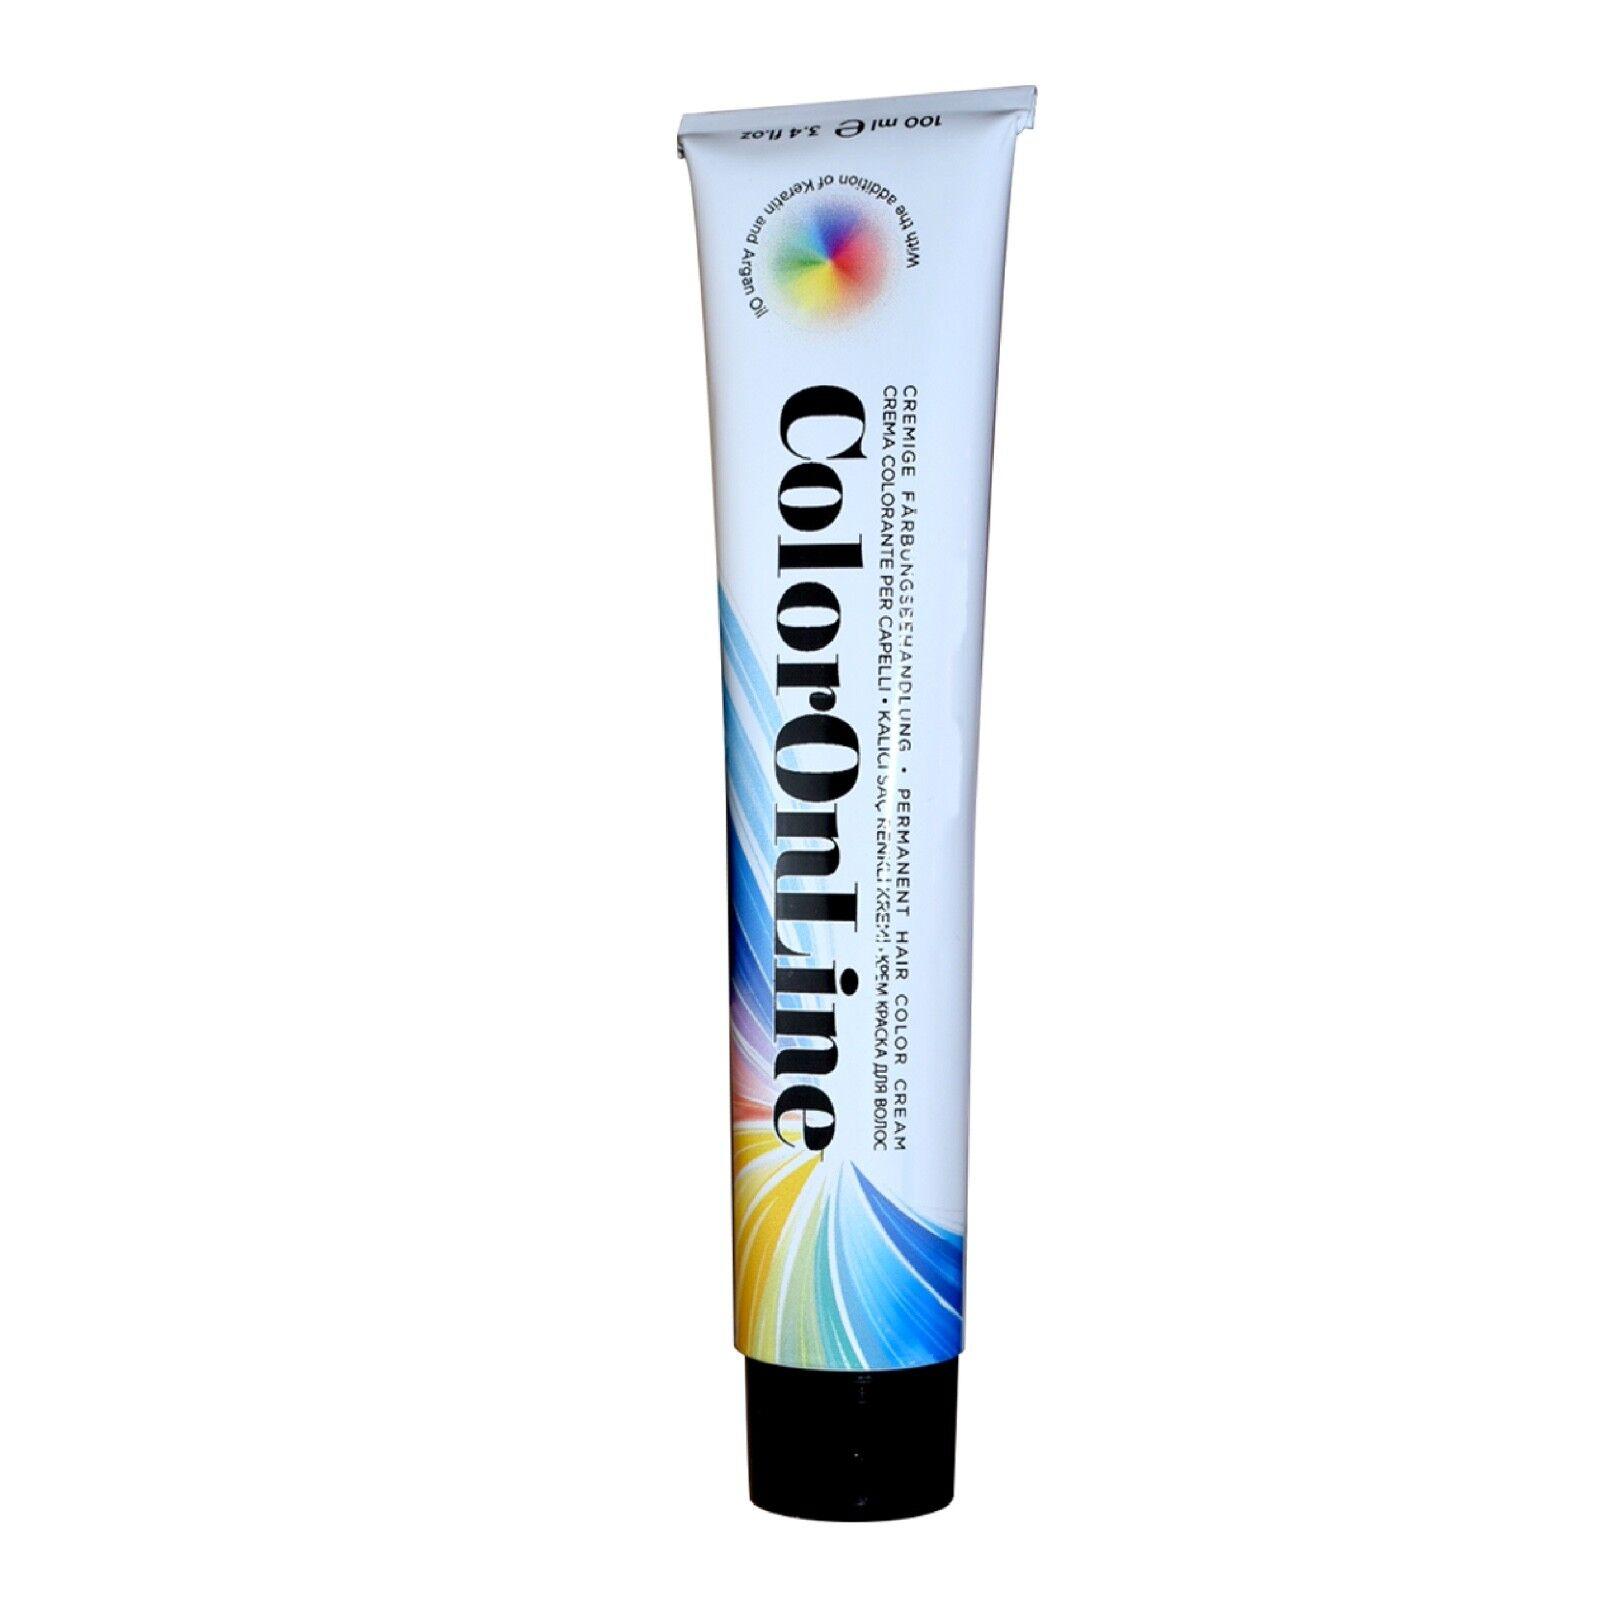 Coloronline Haarfarben alle Nuancen 100ml Friseurbedarf